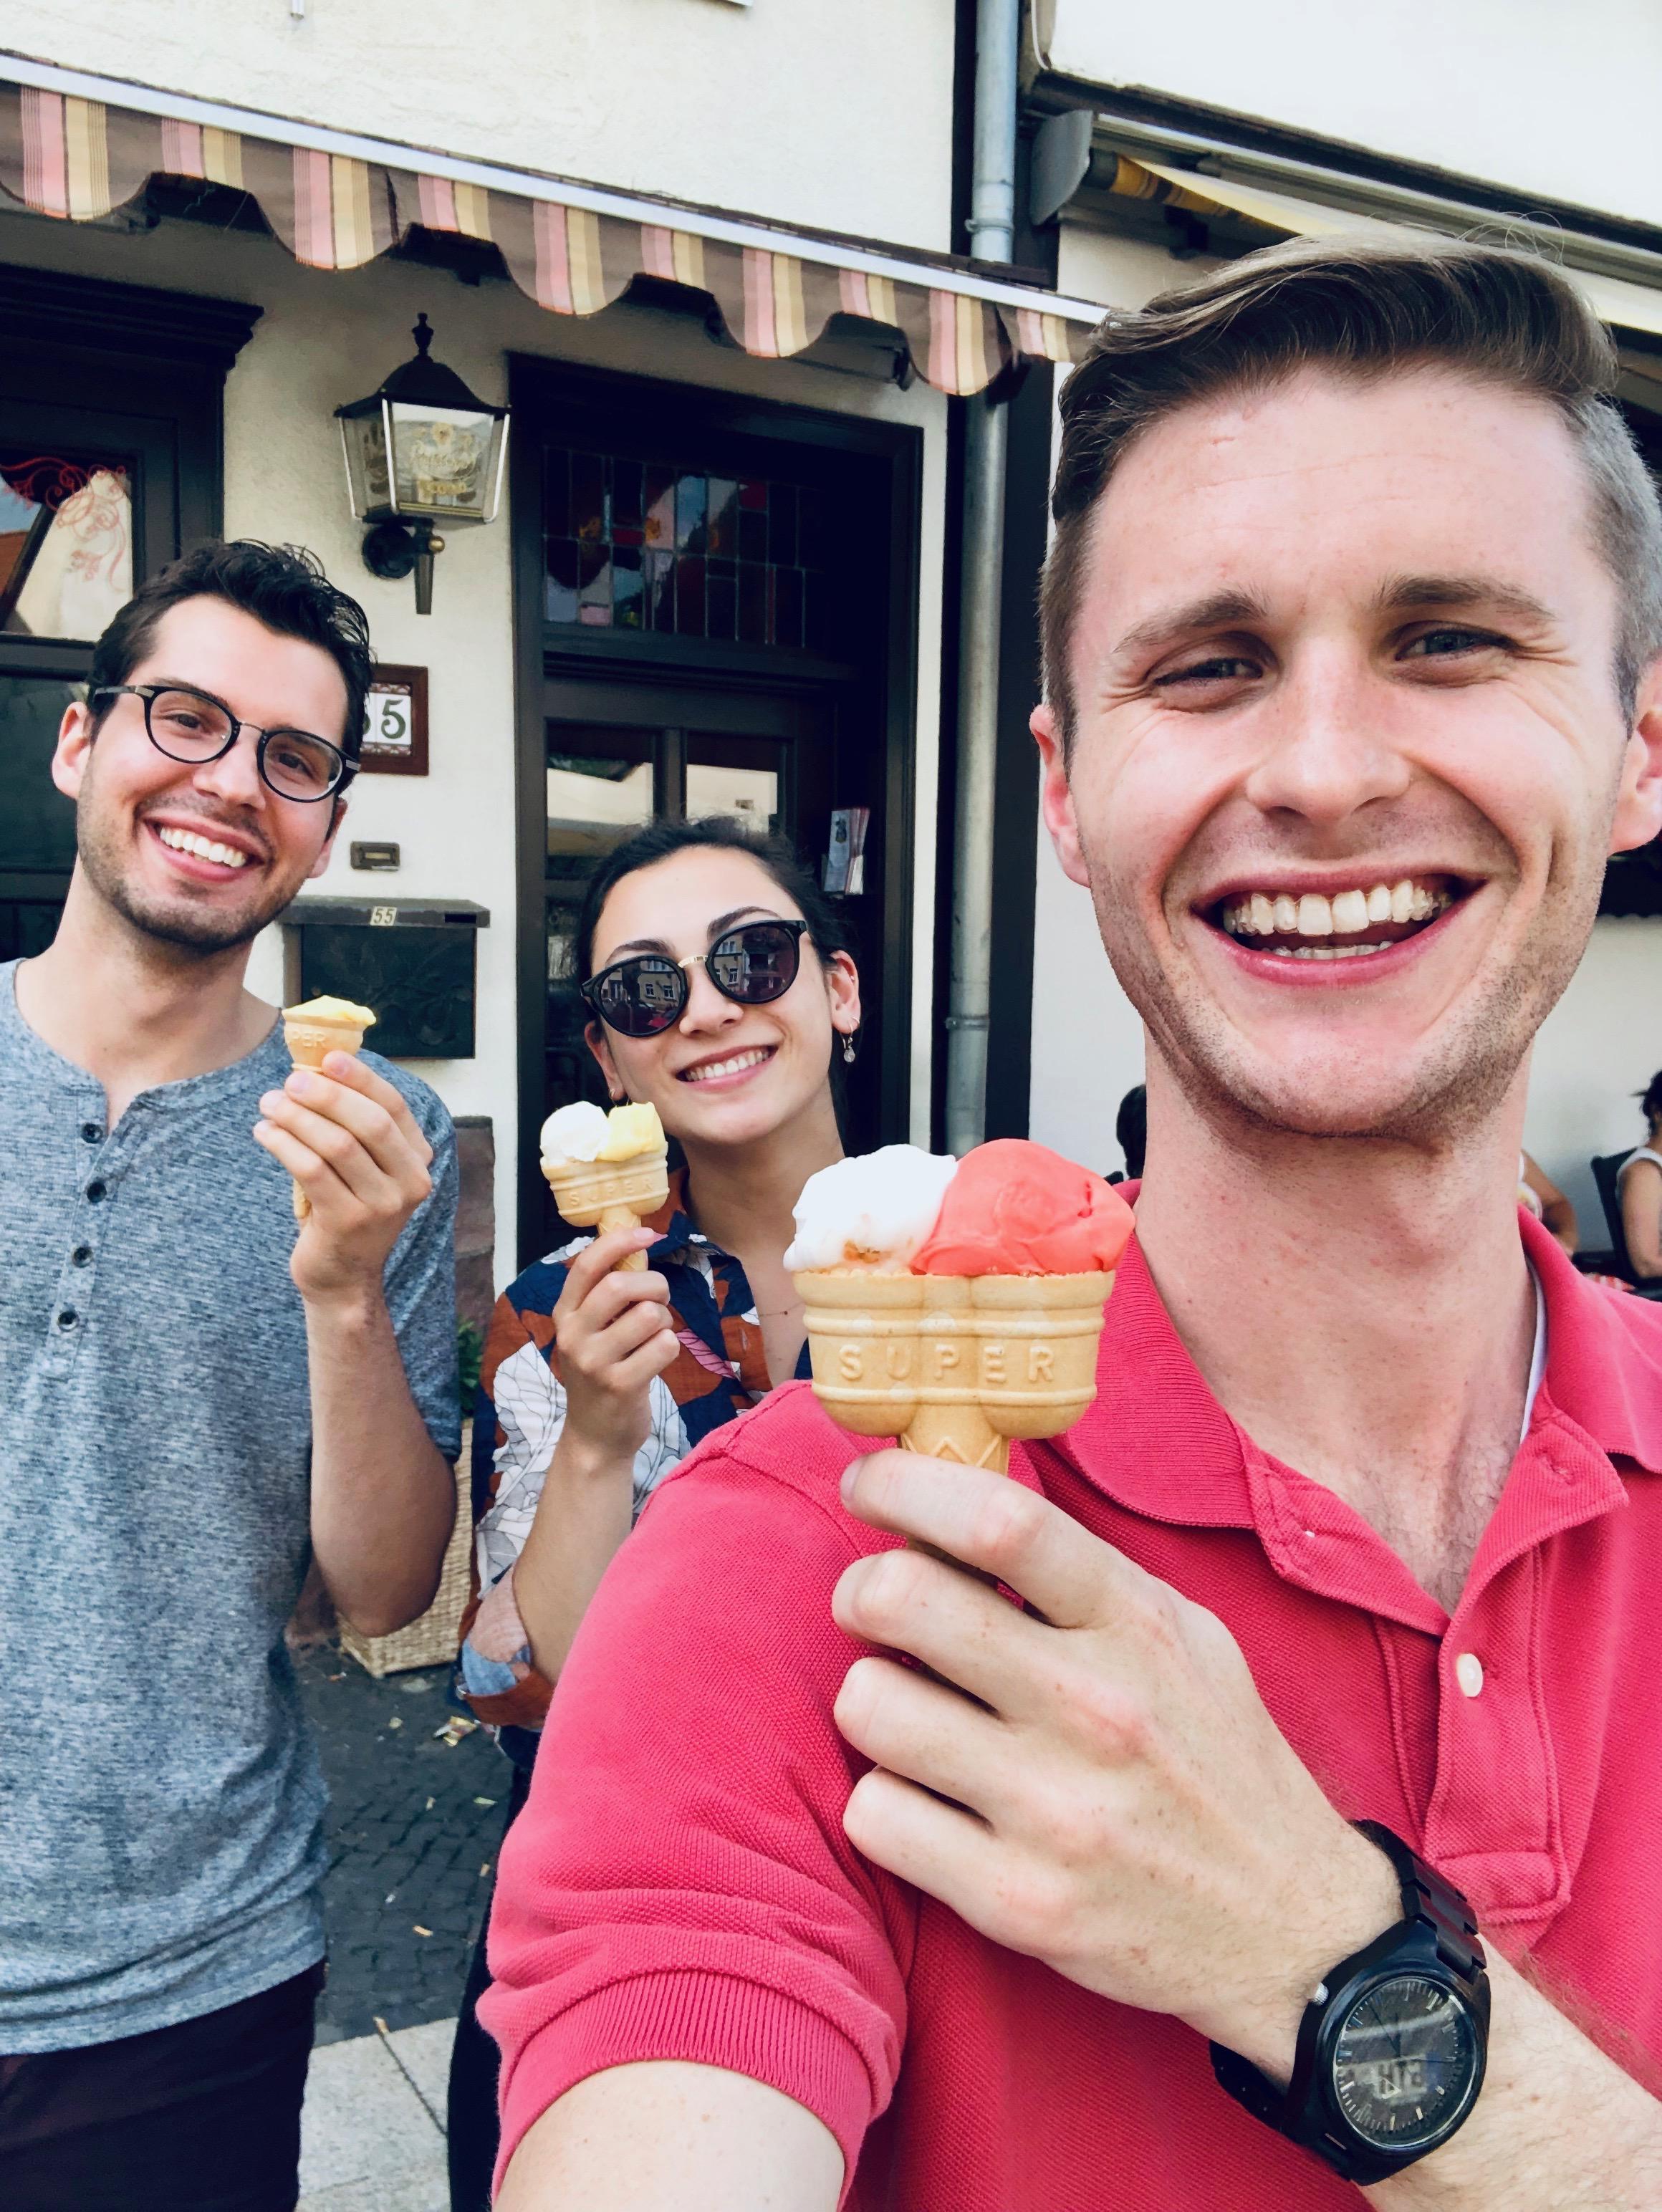 Nick Capozzoli, Meg Cutting, and Evan Currie enjoy an ice cream break in Waltershausen.